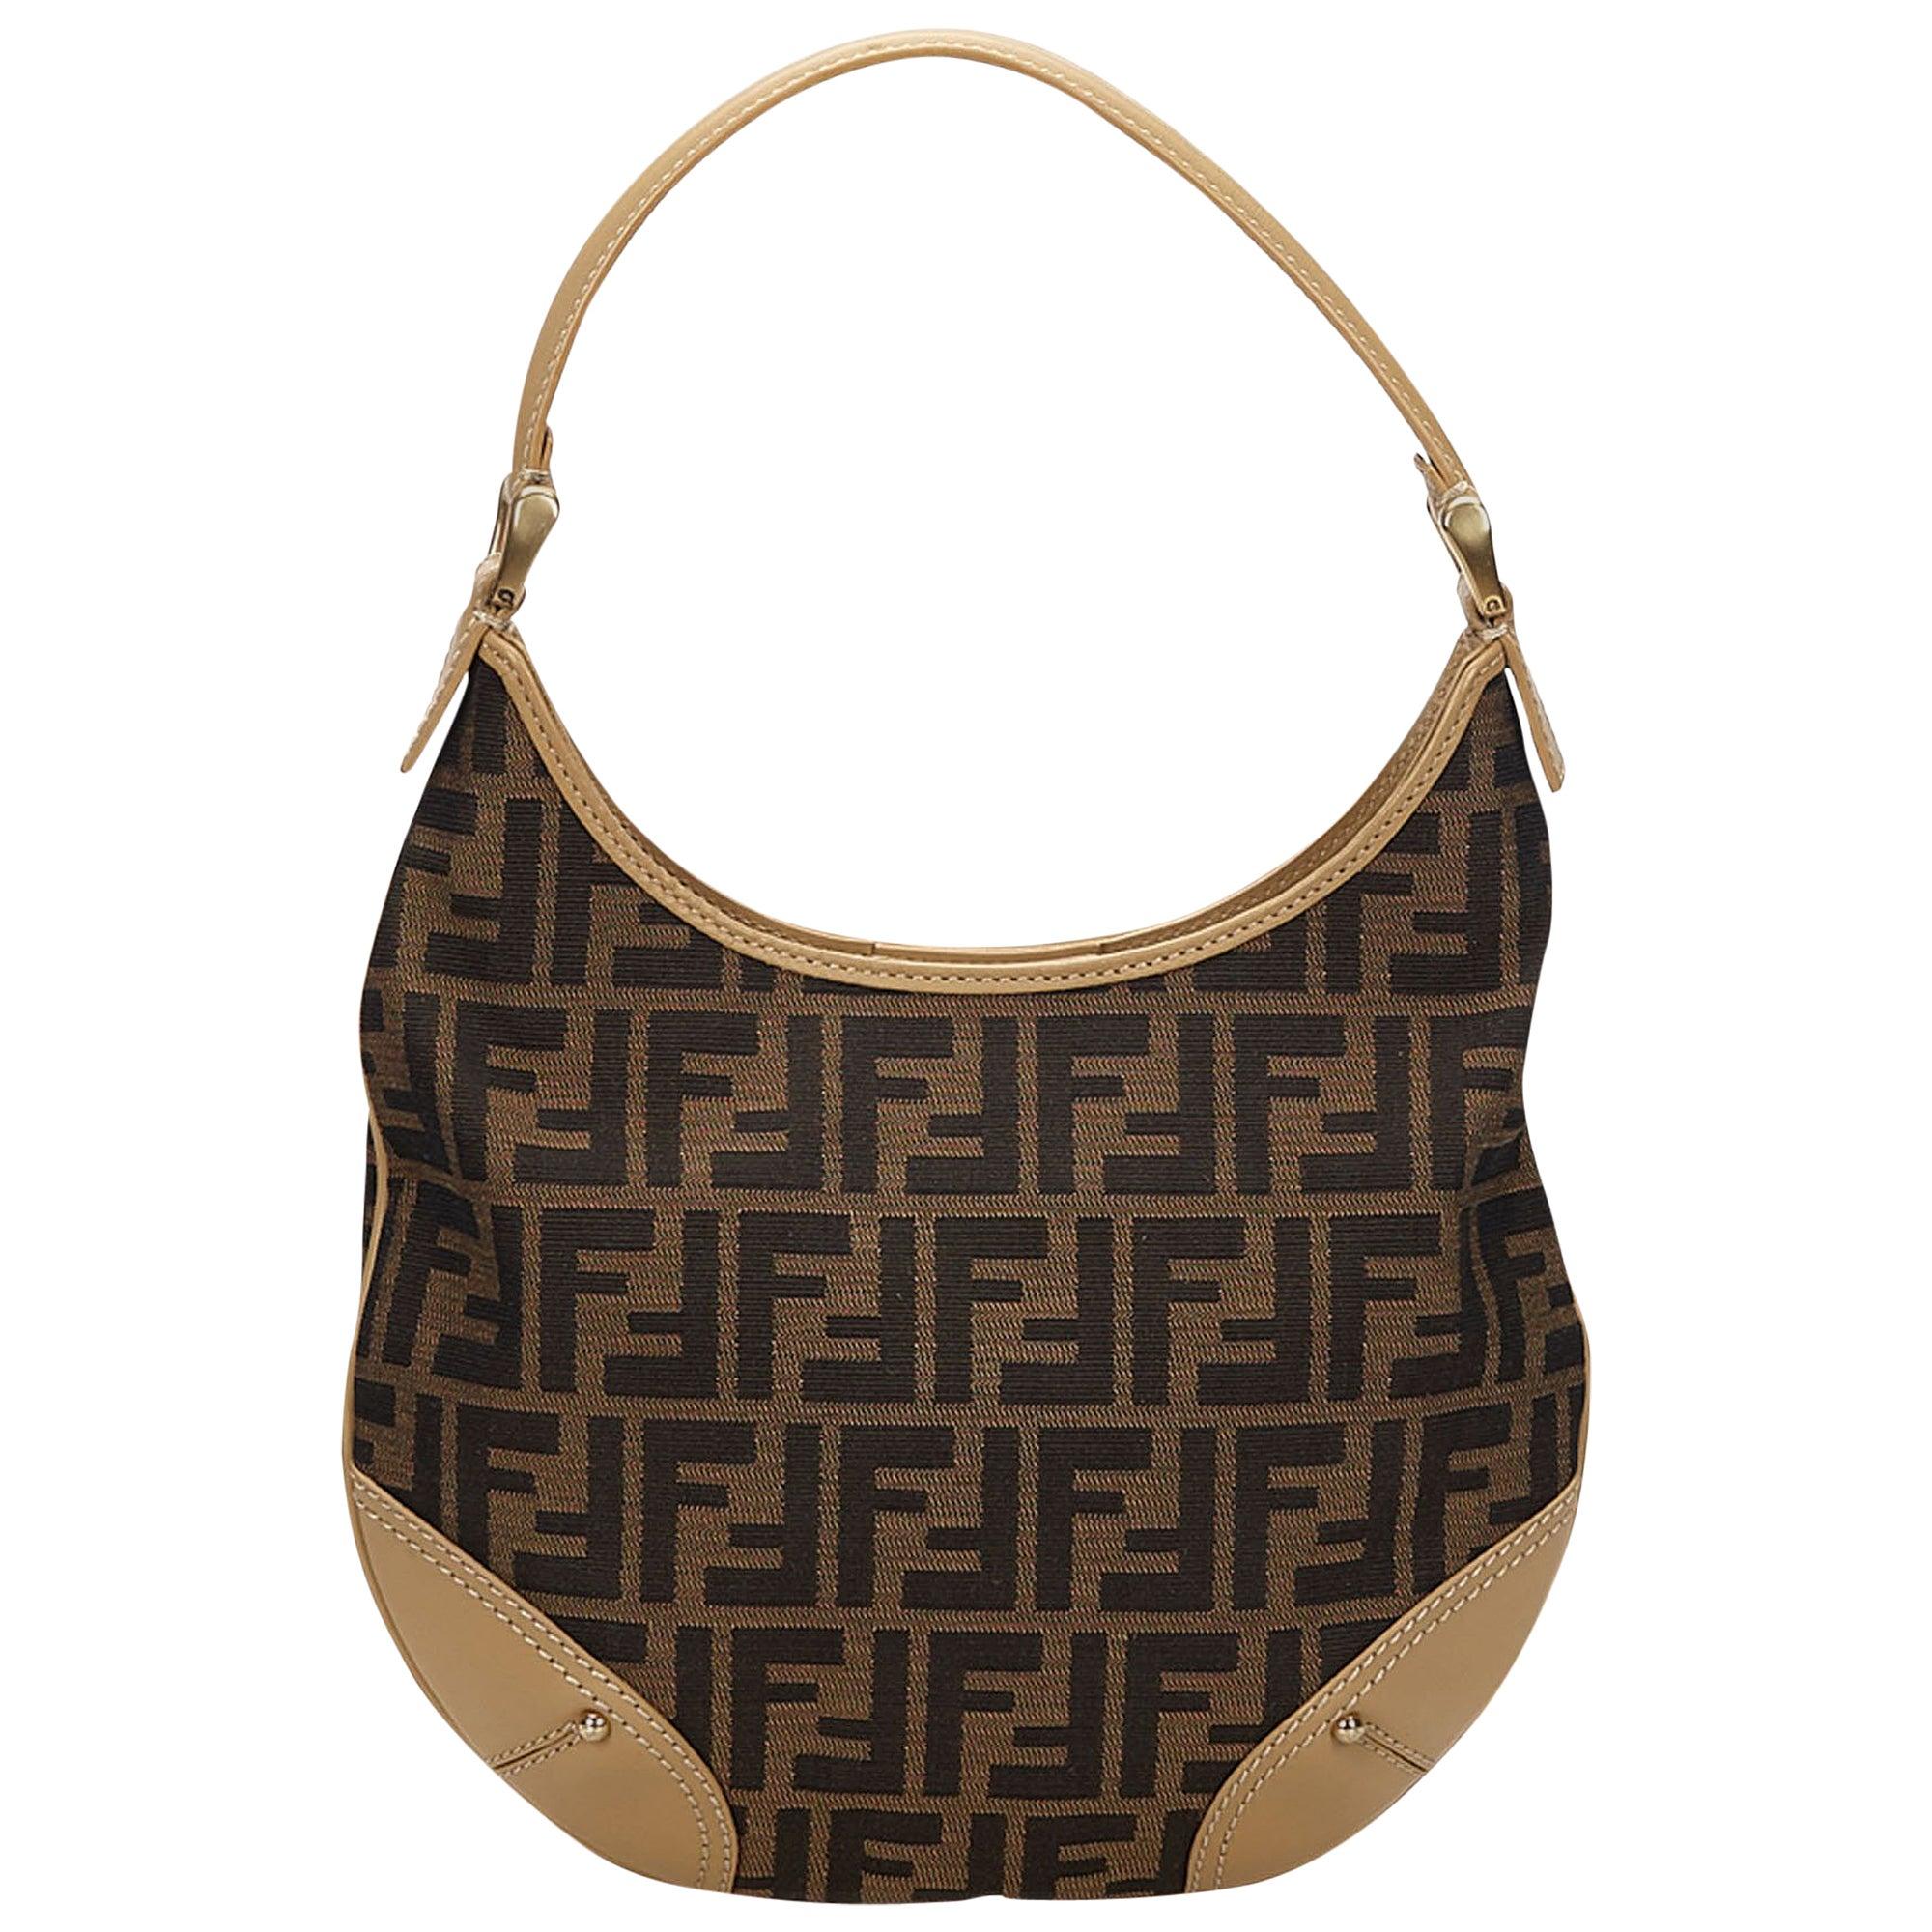 8412f8479465 Fendi Brown Zucca Jacquard Hobo Bag For Sale at 1stdibs